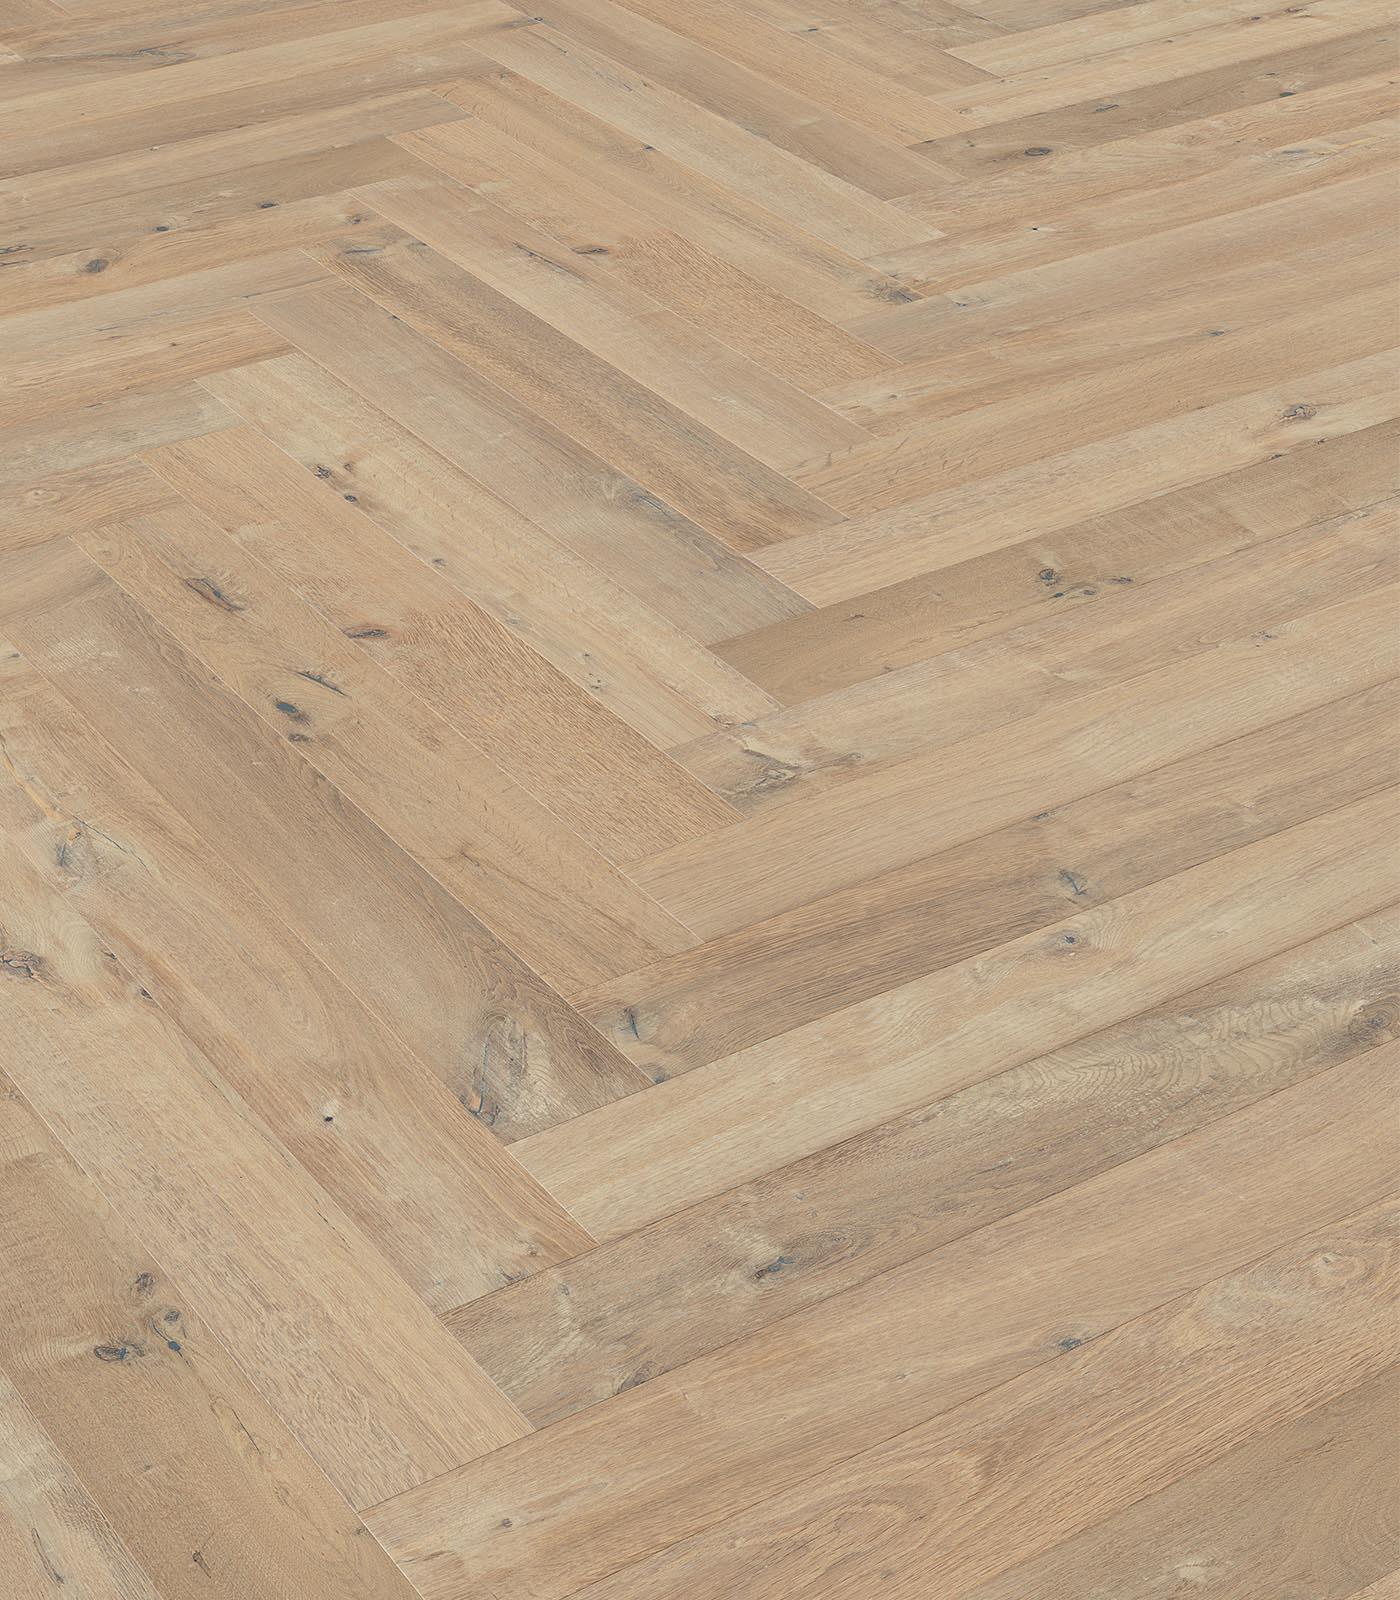 Herringbone-Fashion collection-Mauritius-Western European oak flooring-angle